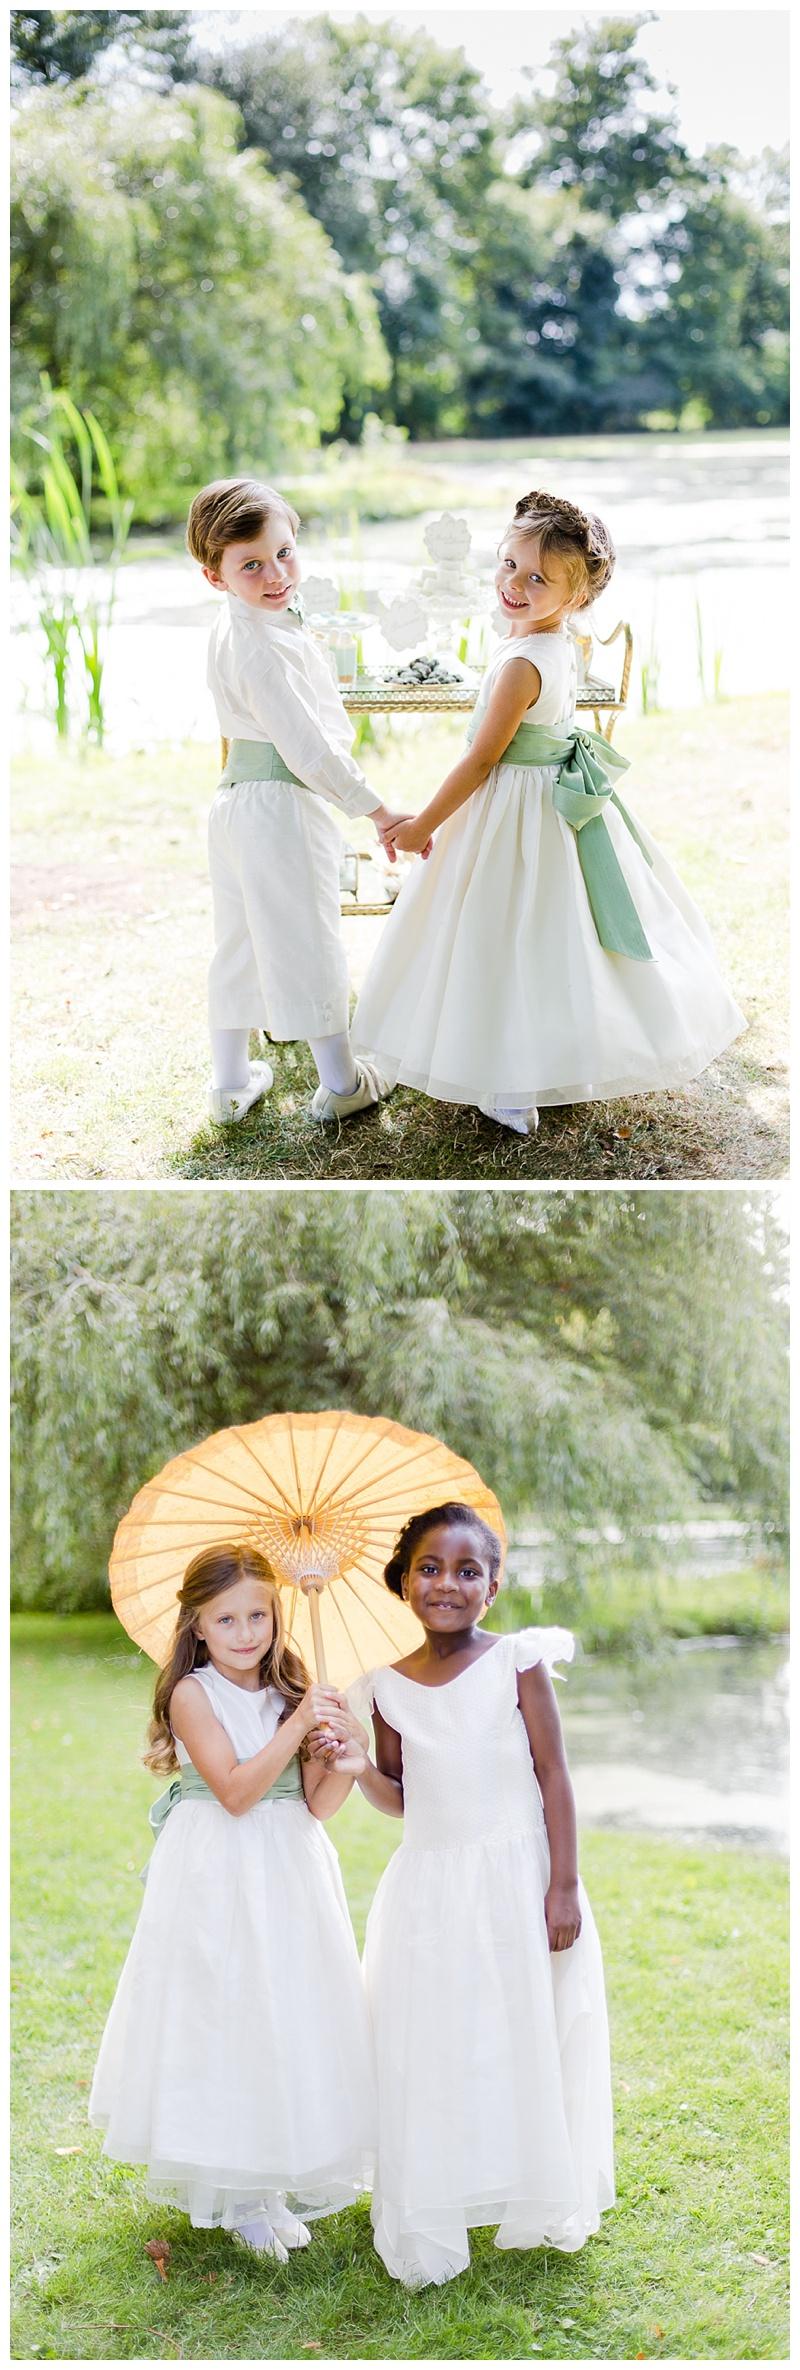 Wedding Inspiration: Sophisticated Garden Part 2